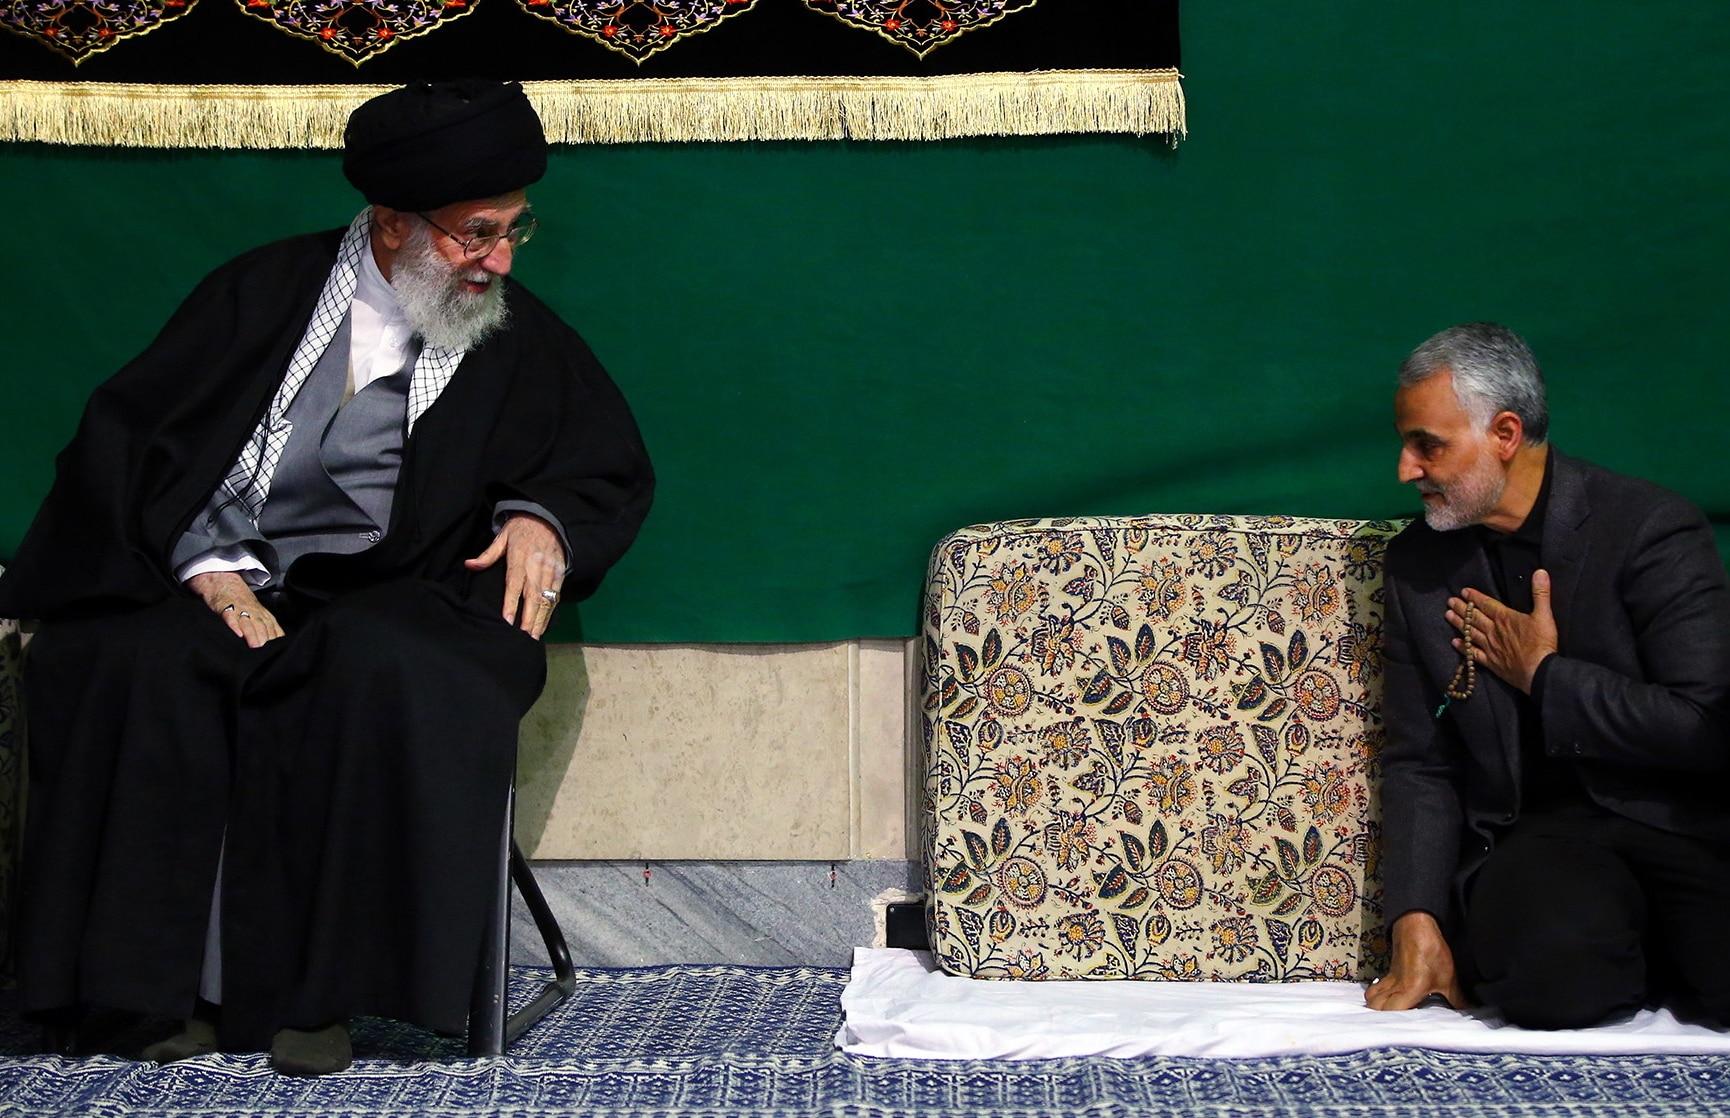 Iran's Supreme Leader Ayatollah Ali Khamenei  greets Qasem Soleimani during a religious ceremony in Tehran.